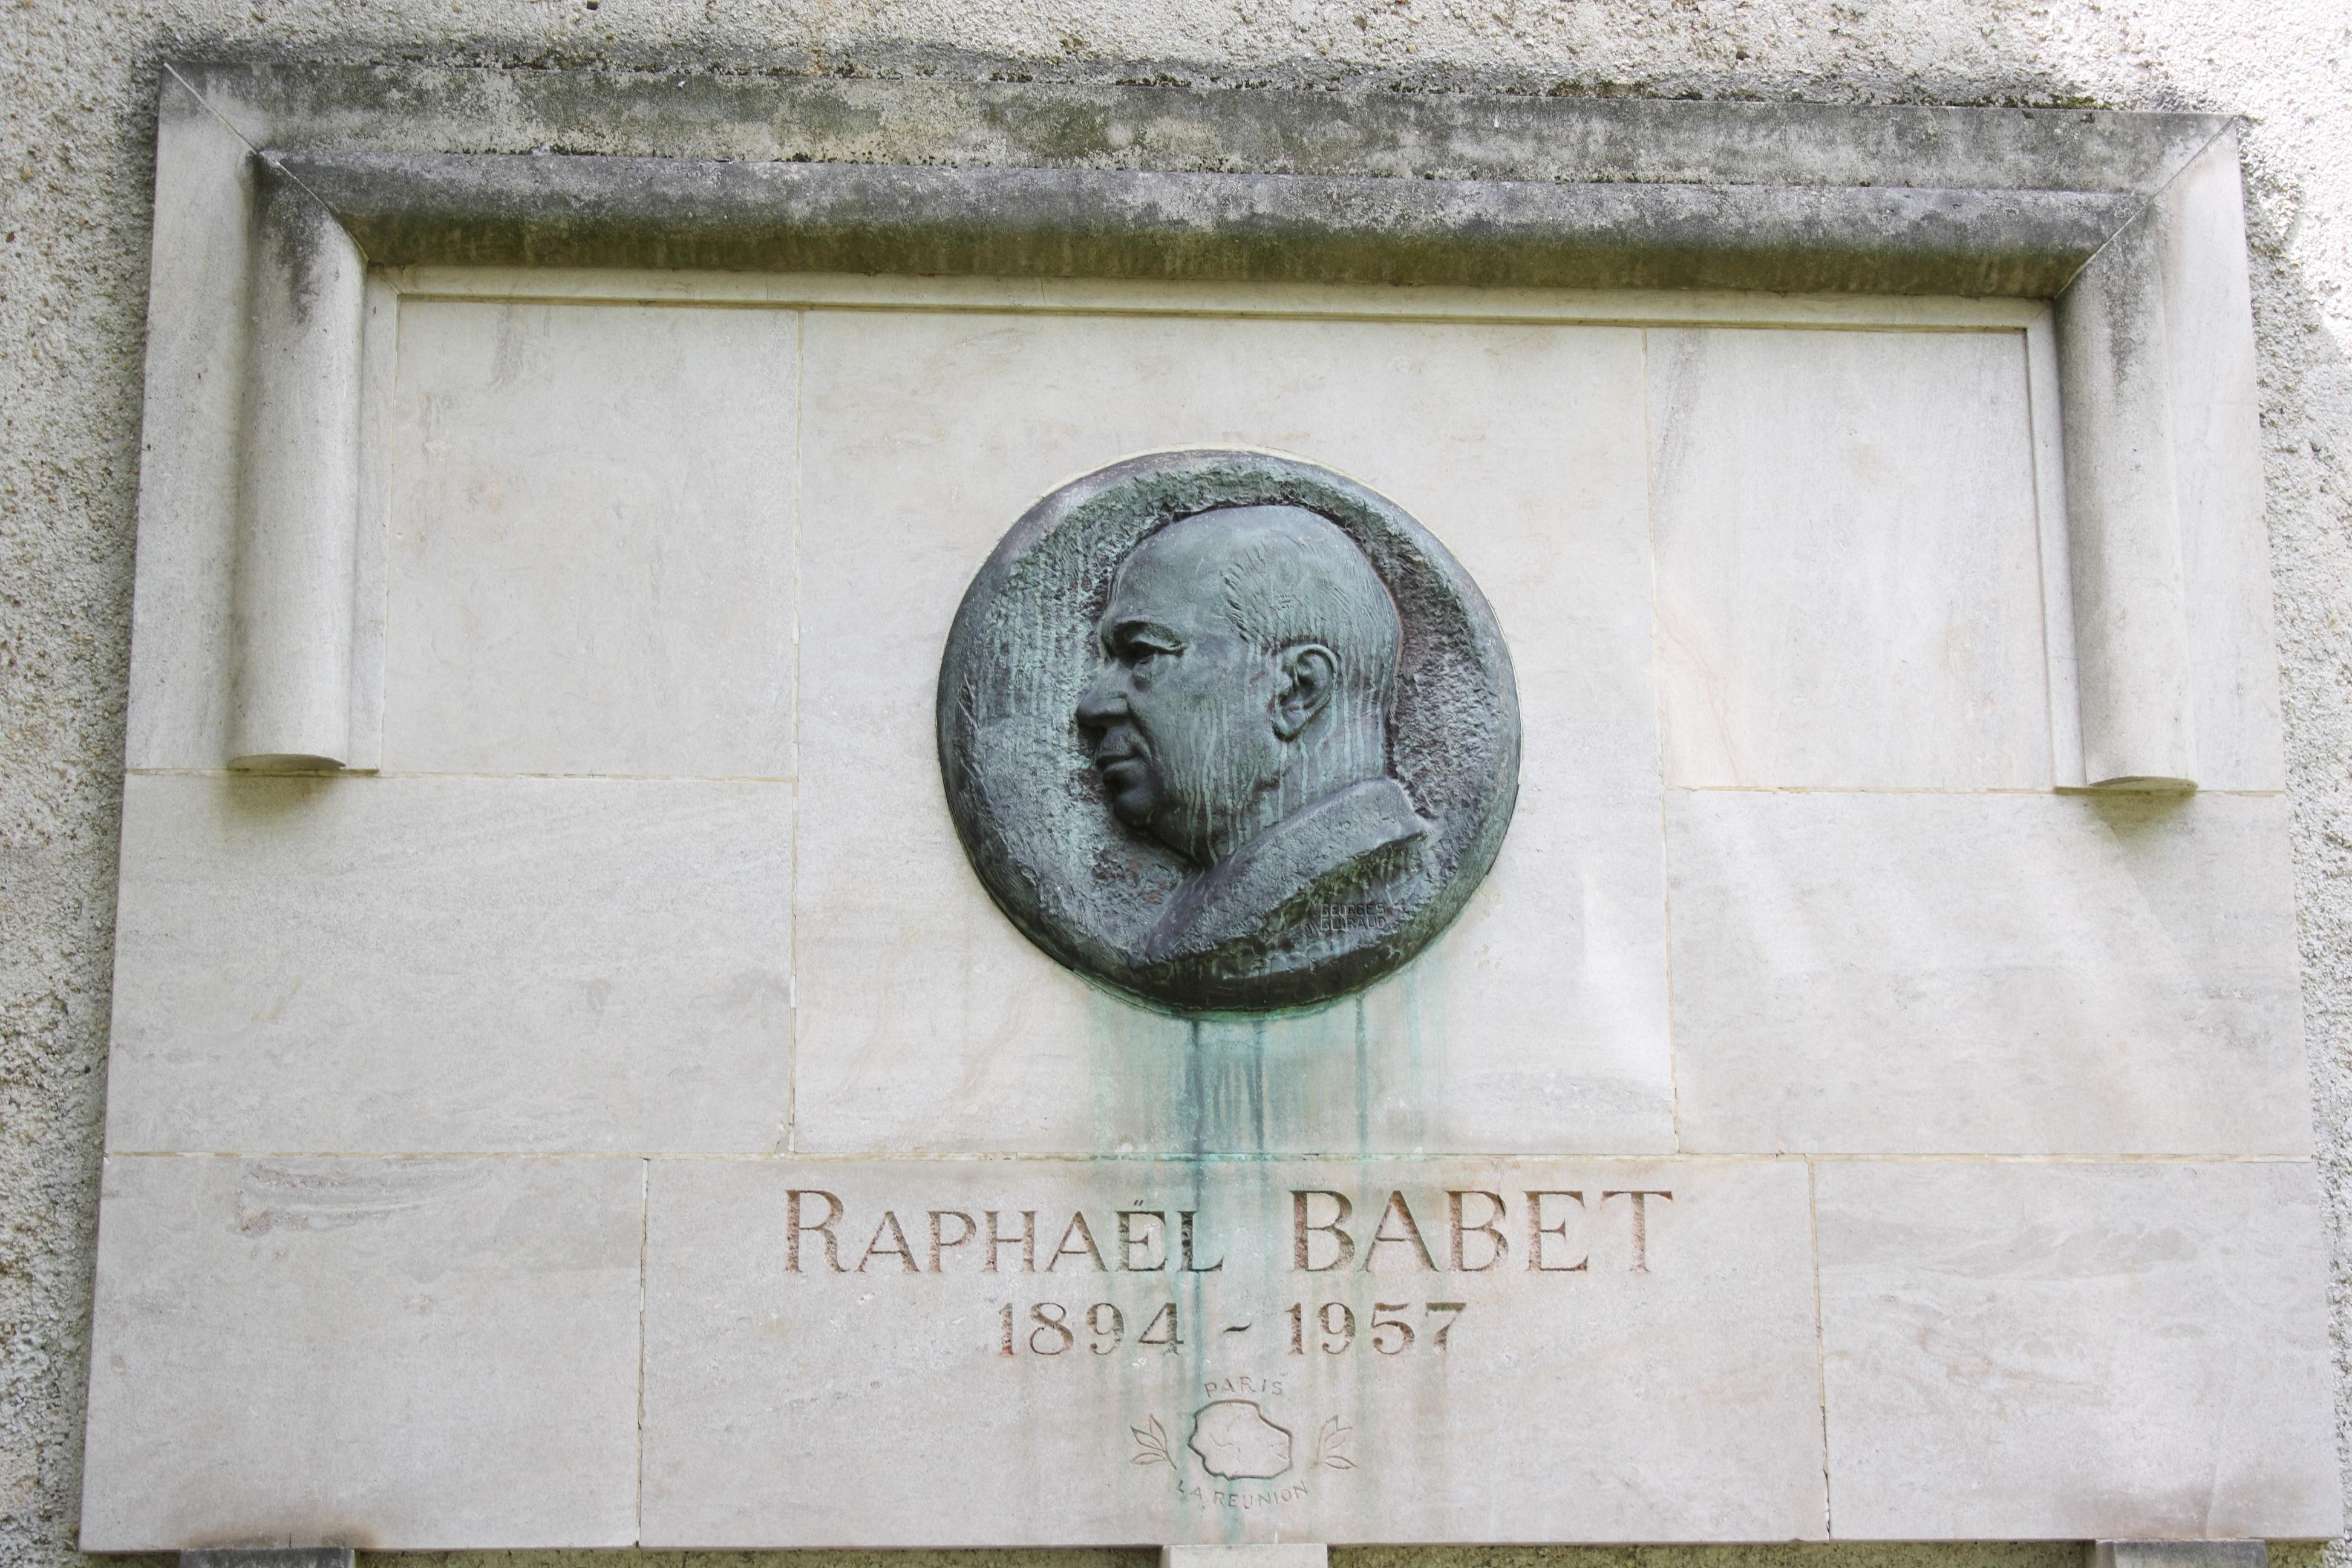 https://upload.wikimedia.org/wikipedia/commons/e/e0/Paris_Raphaël_Babet6780.JPG